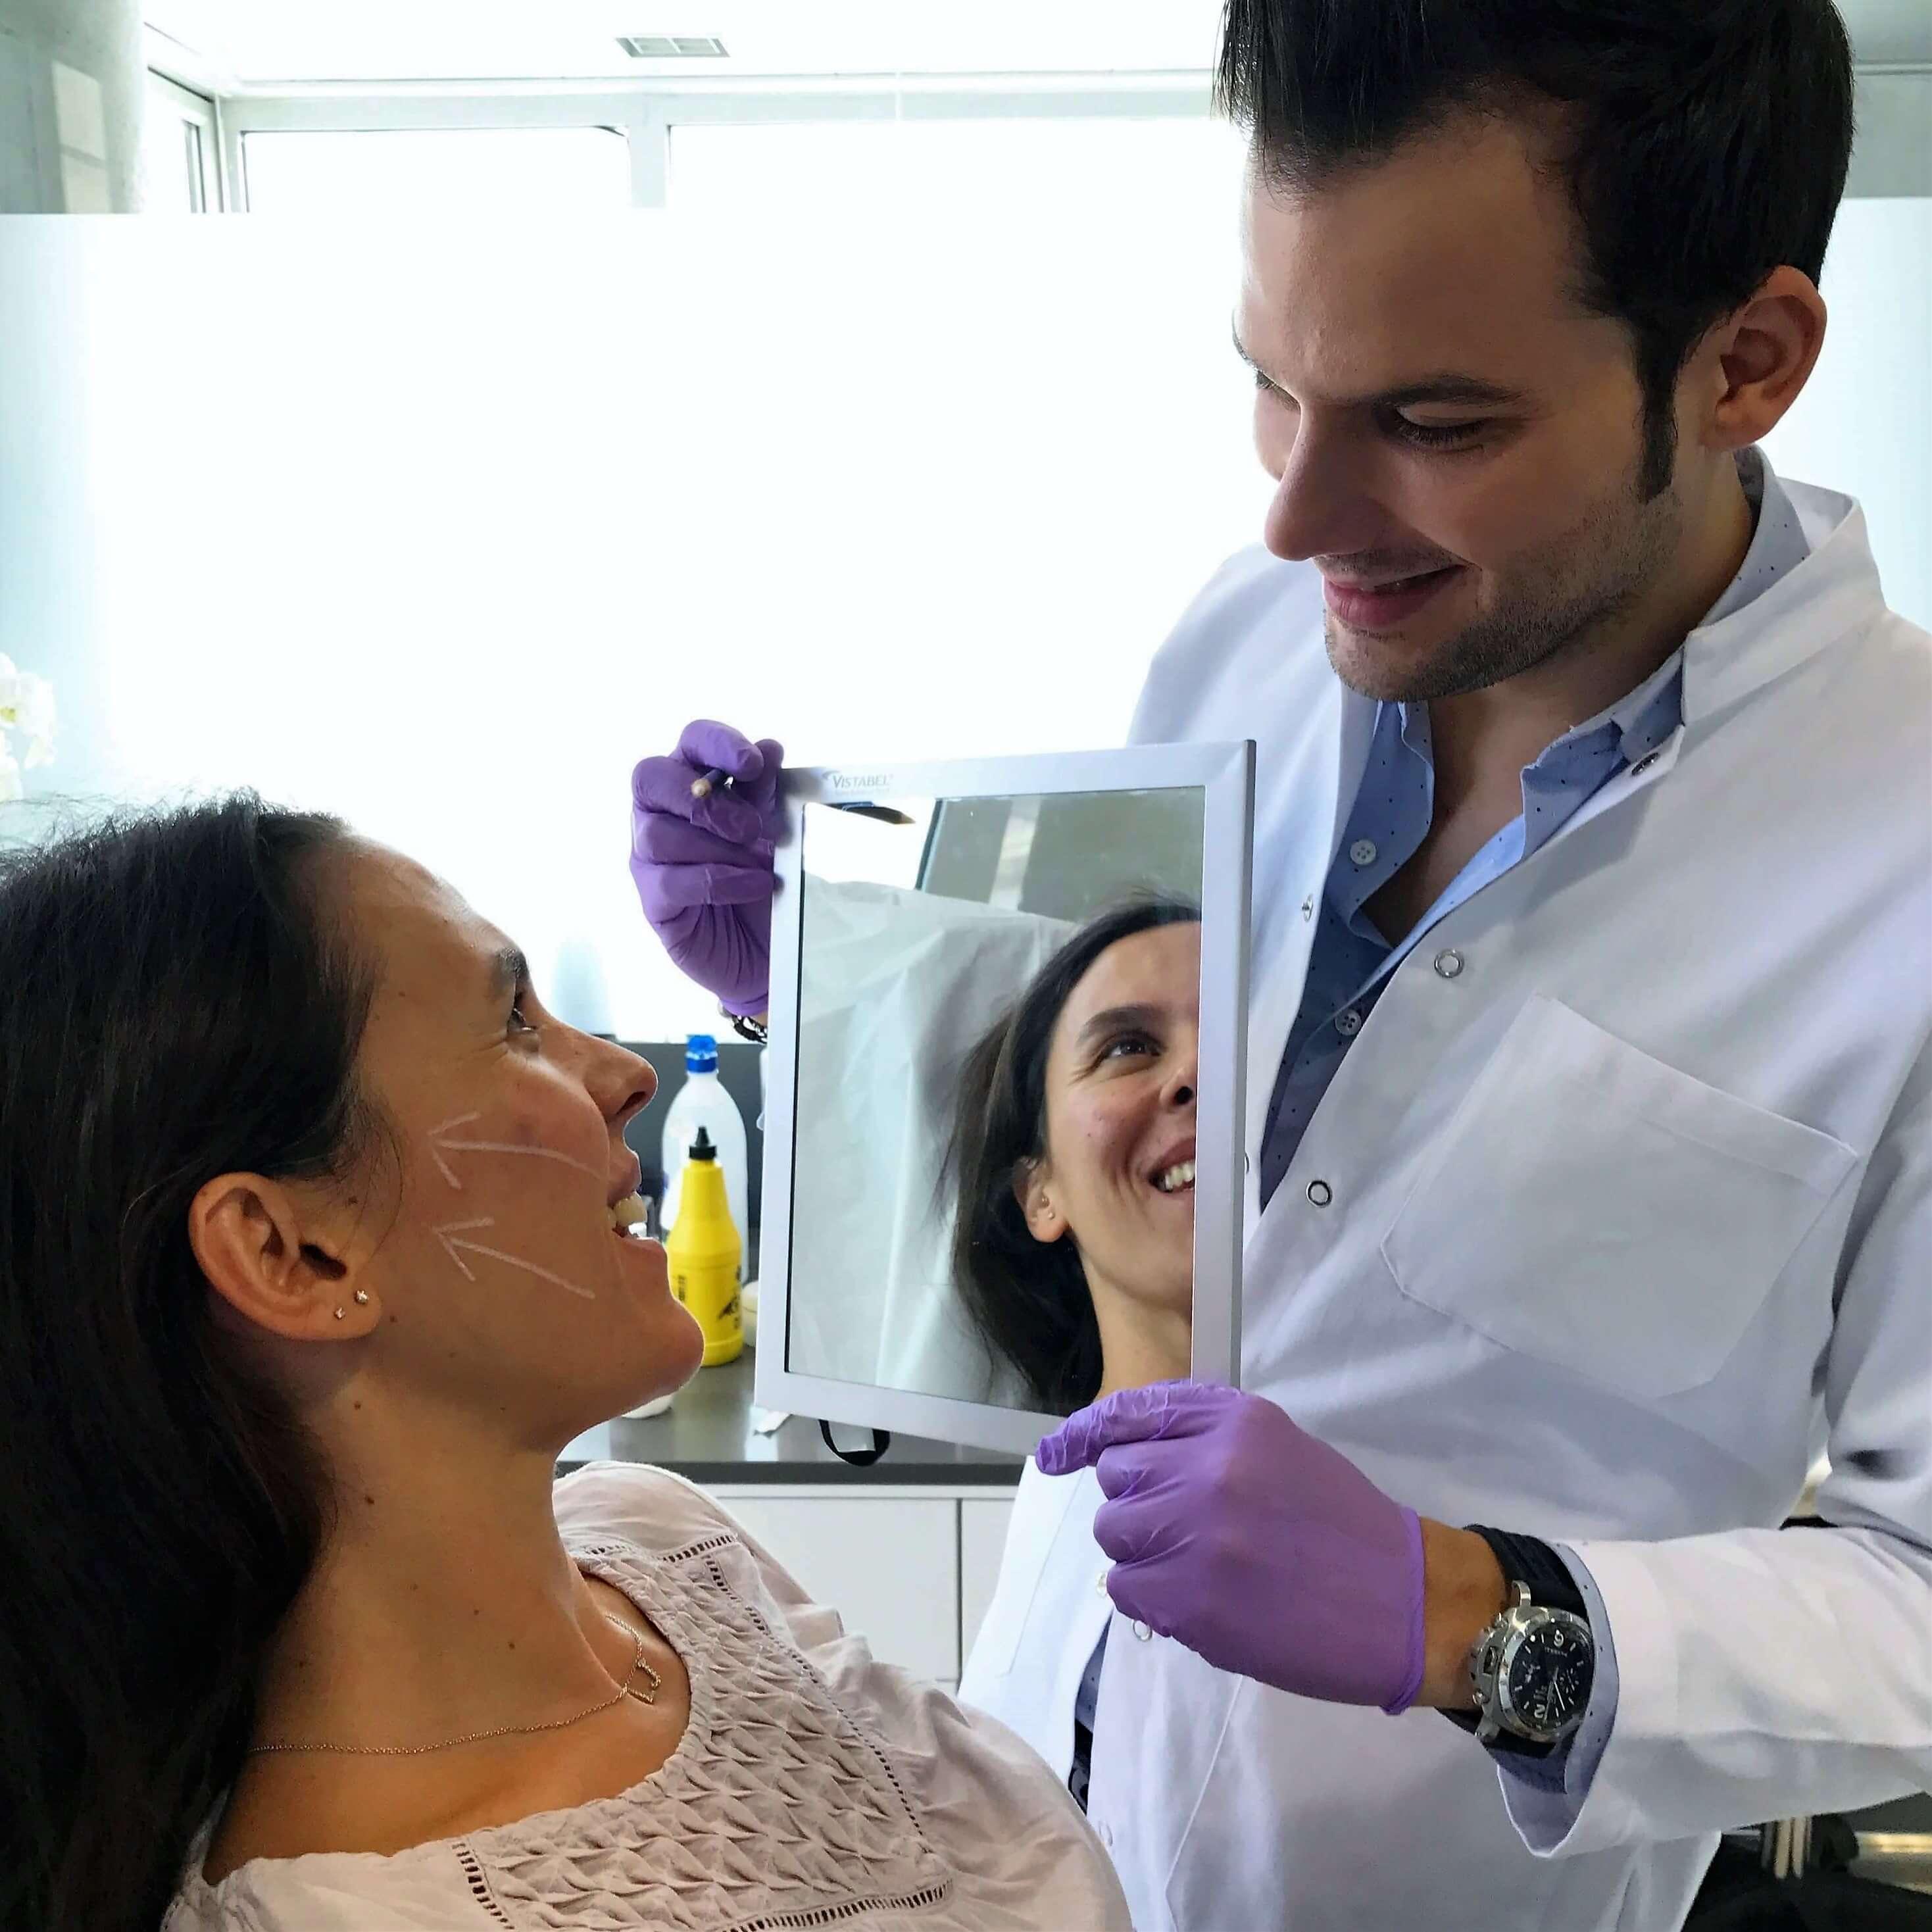 La Mejor Clínica de Medicina Estética en Barcelona